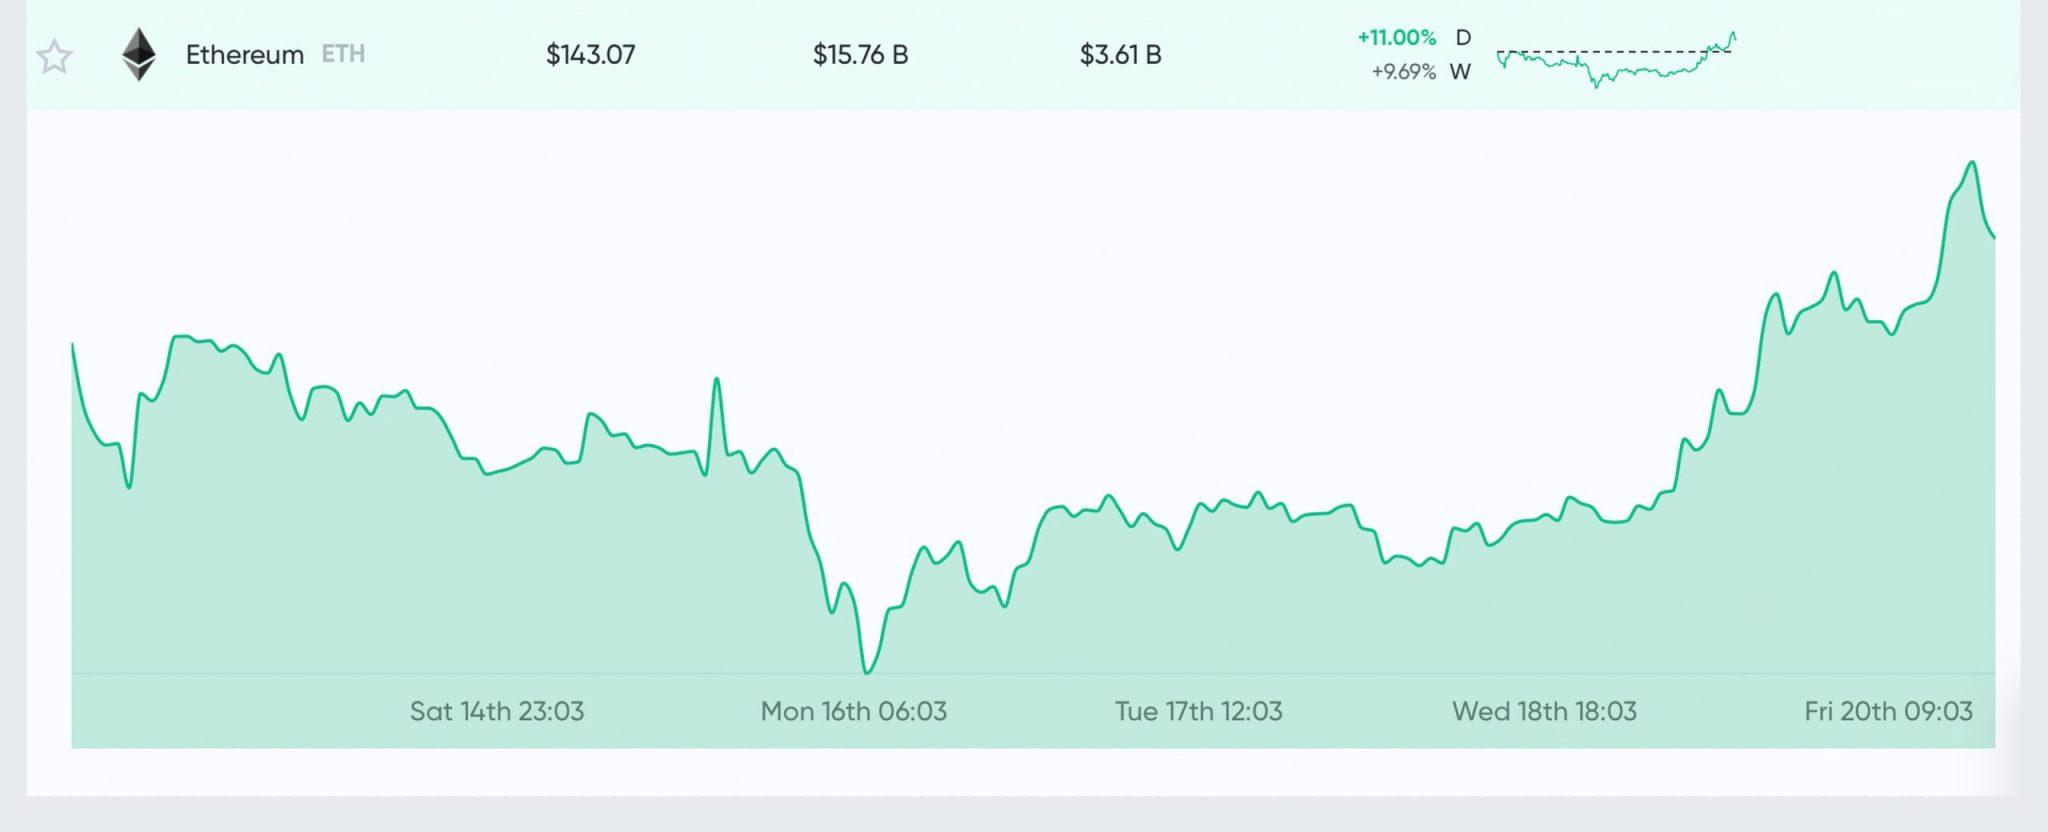 Market Update: Bulls Return, 120 Million Tethers Minted, Bitcoin Halving Looms